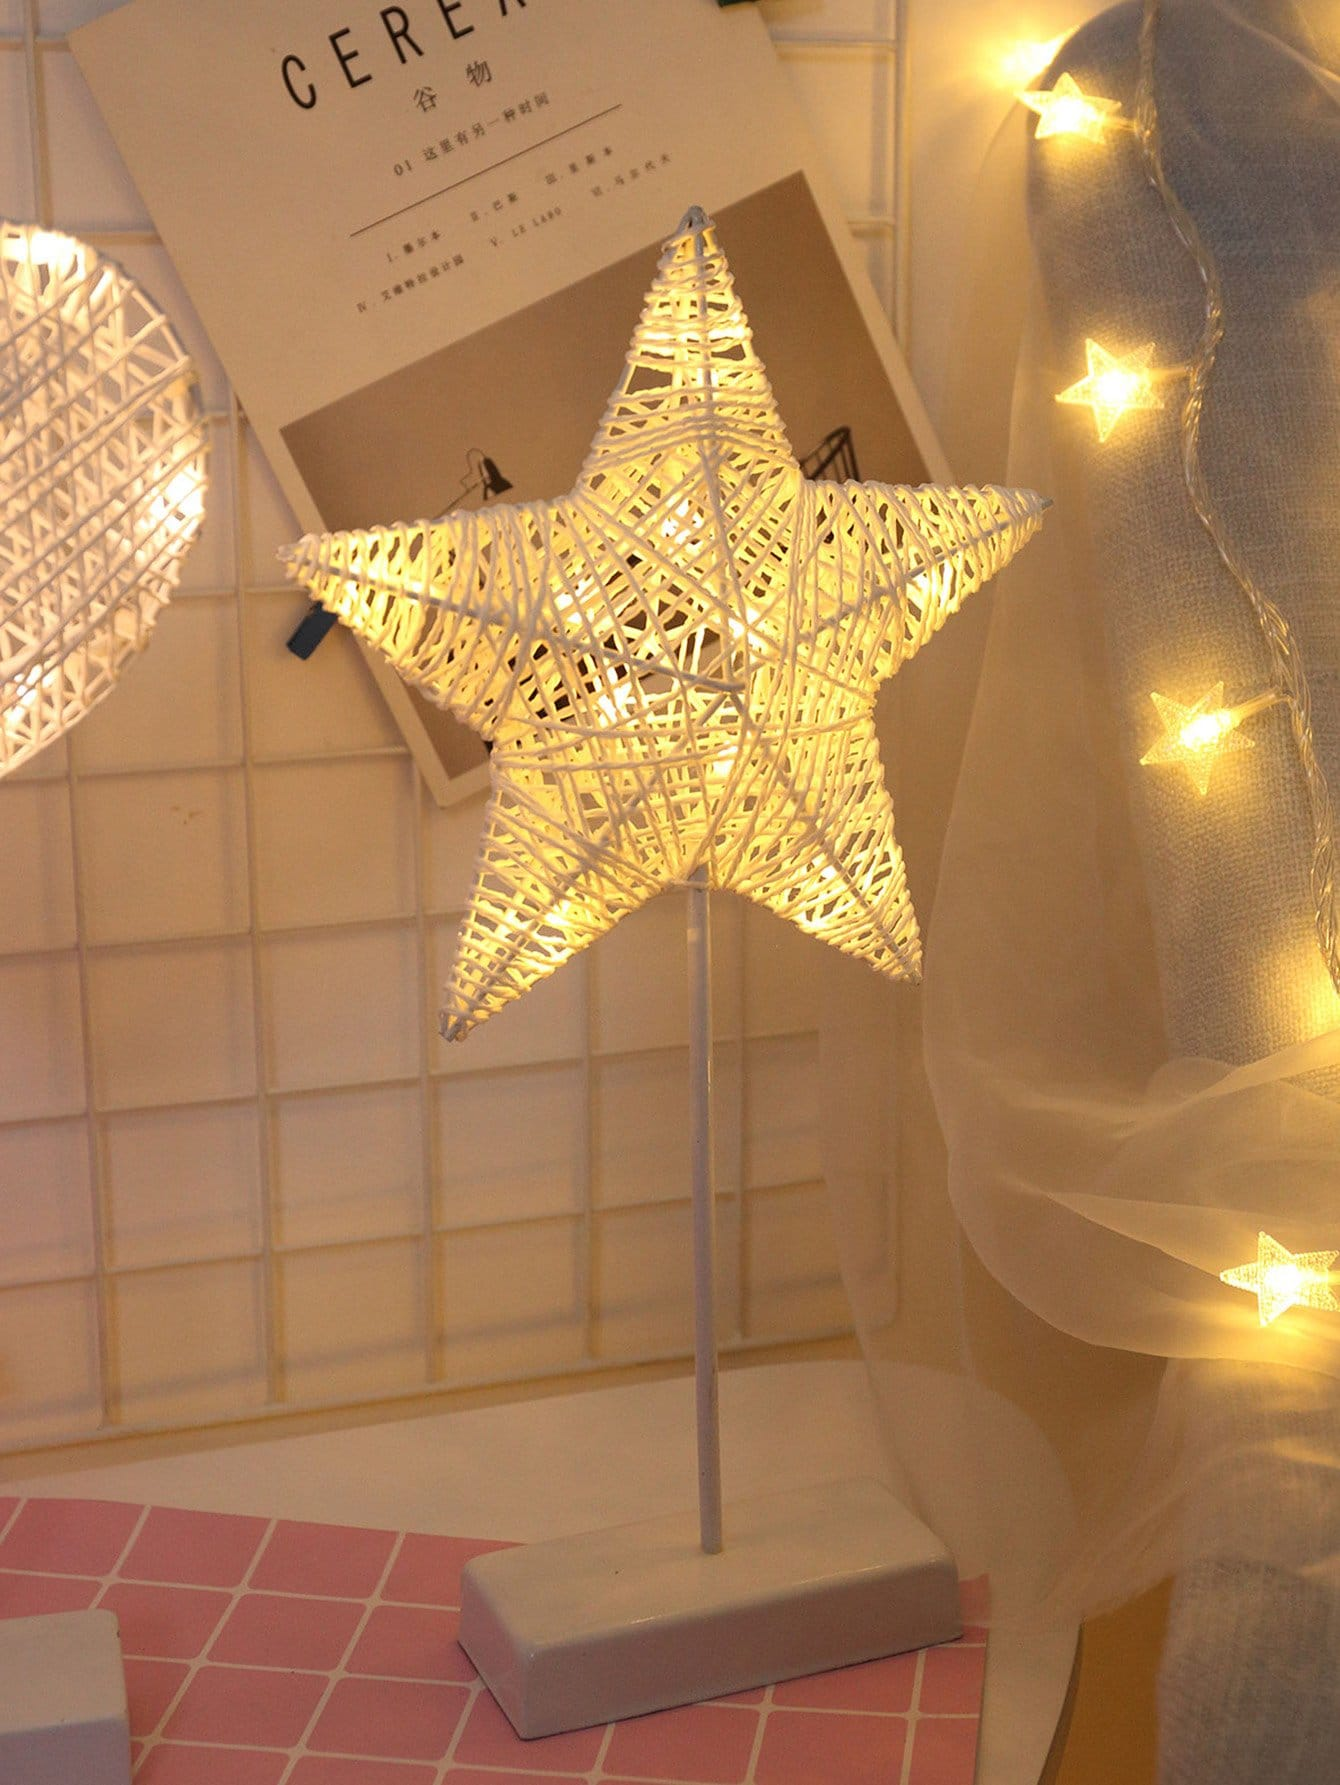 Купить Настольная лампа в форме звезды с 10 лампочк, null, SheIn